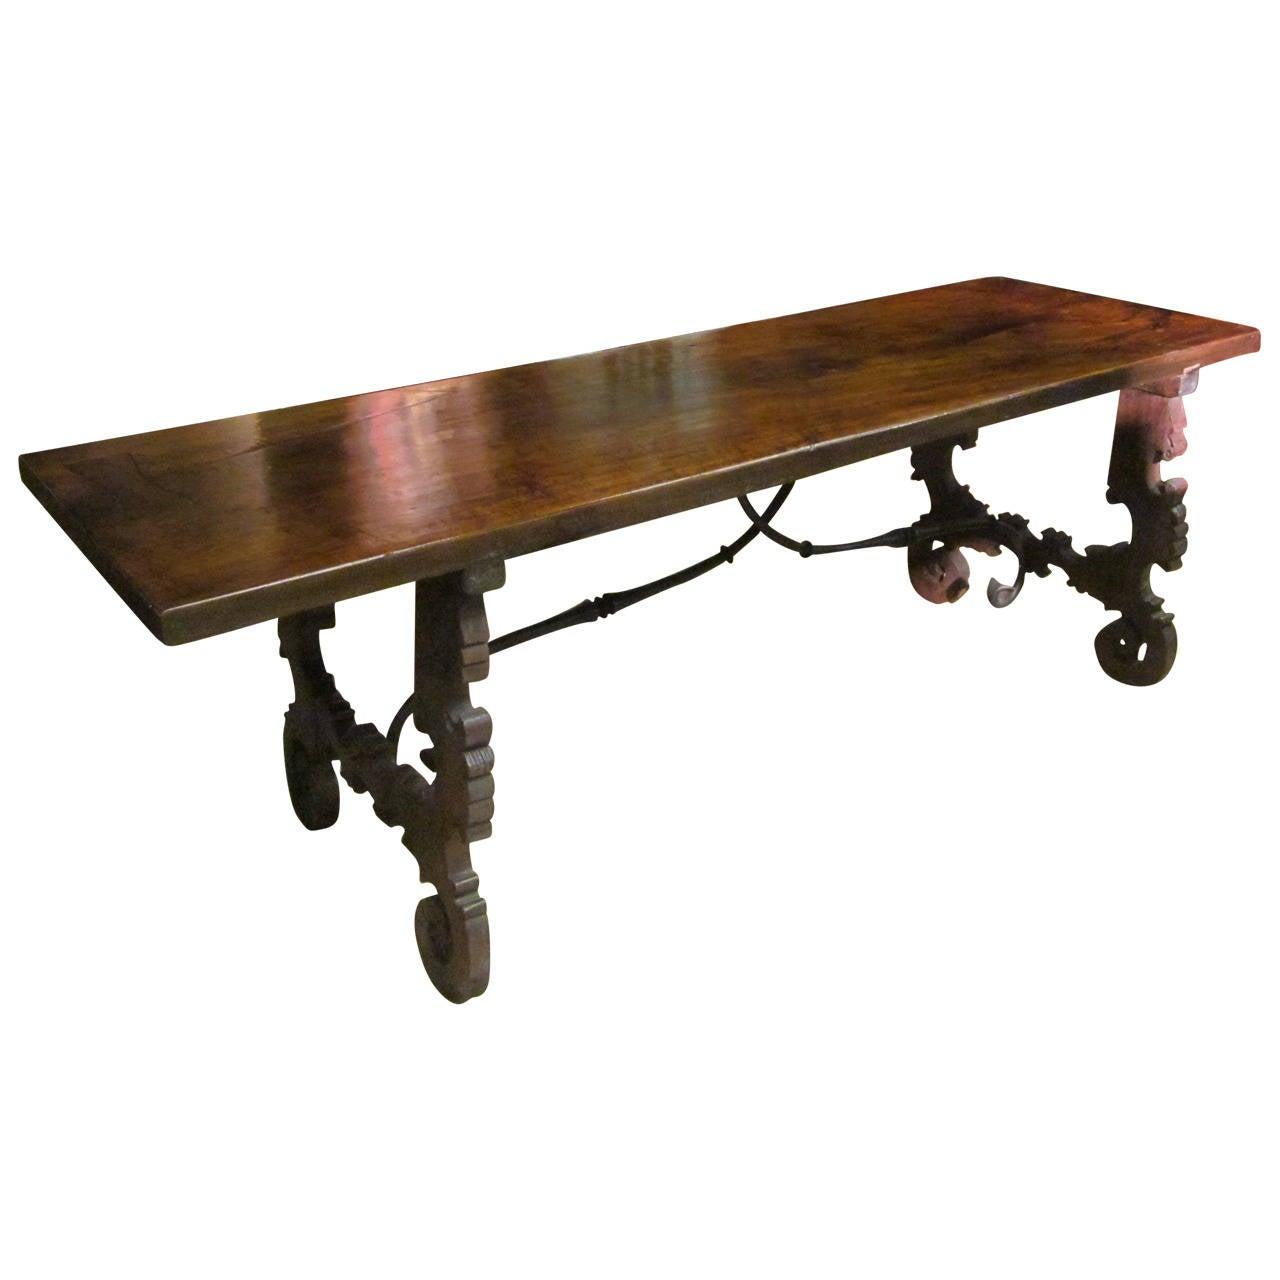 Fratino tavolo console table italy 18th century at 1stdibs for Console tavolo